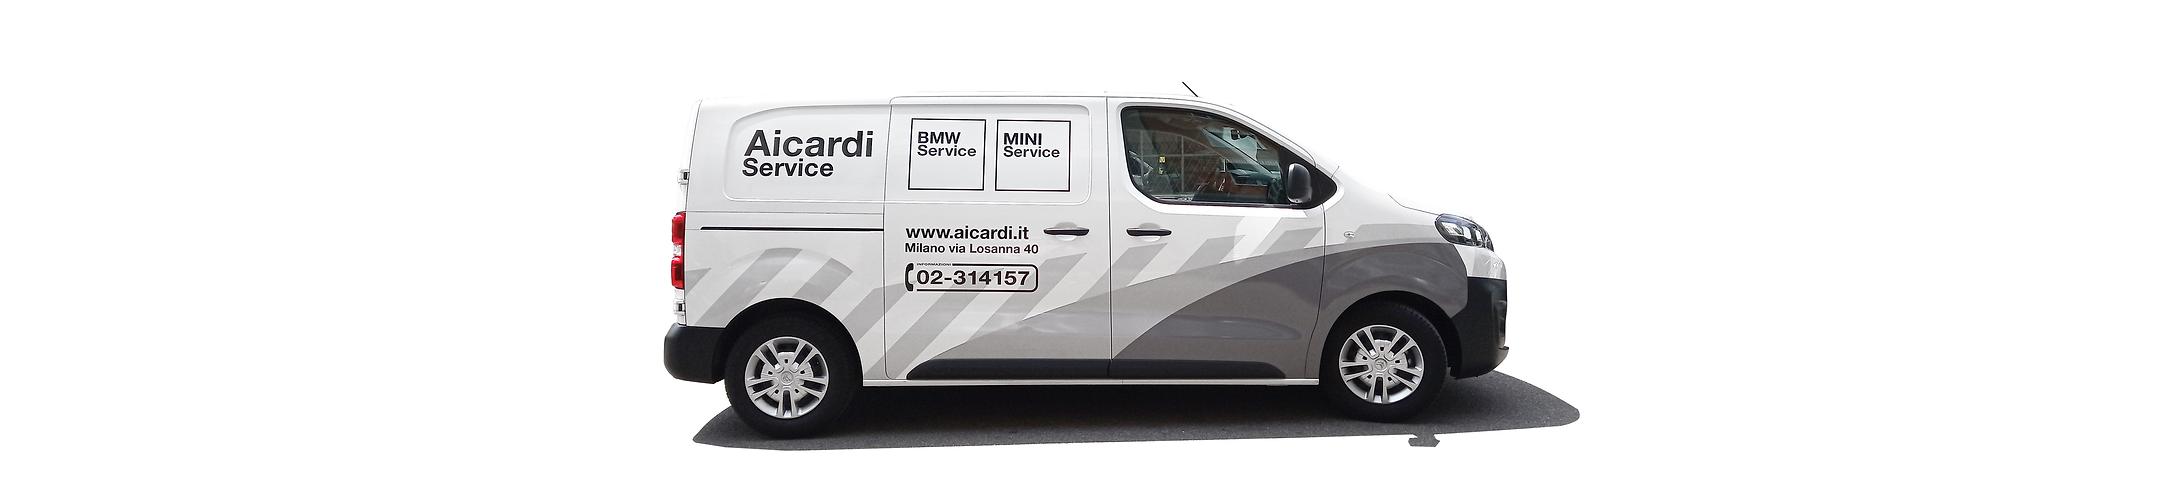 FURGONE-AICARDI-SERVICE.png